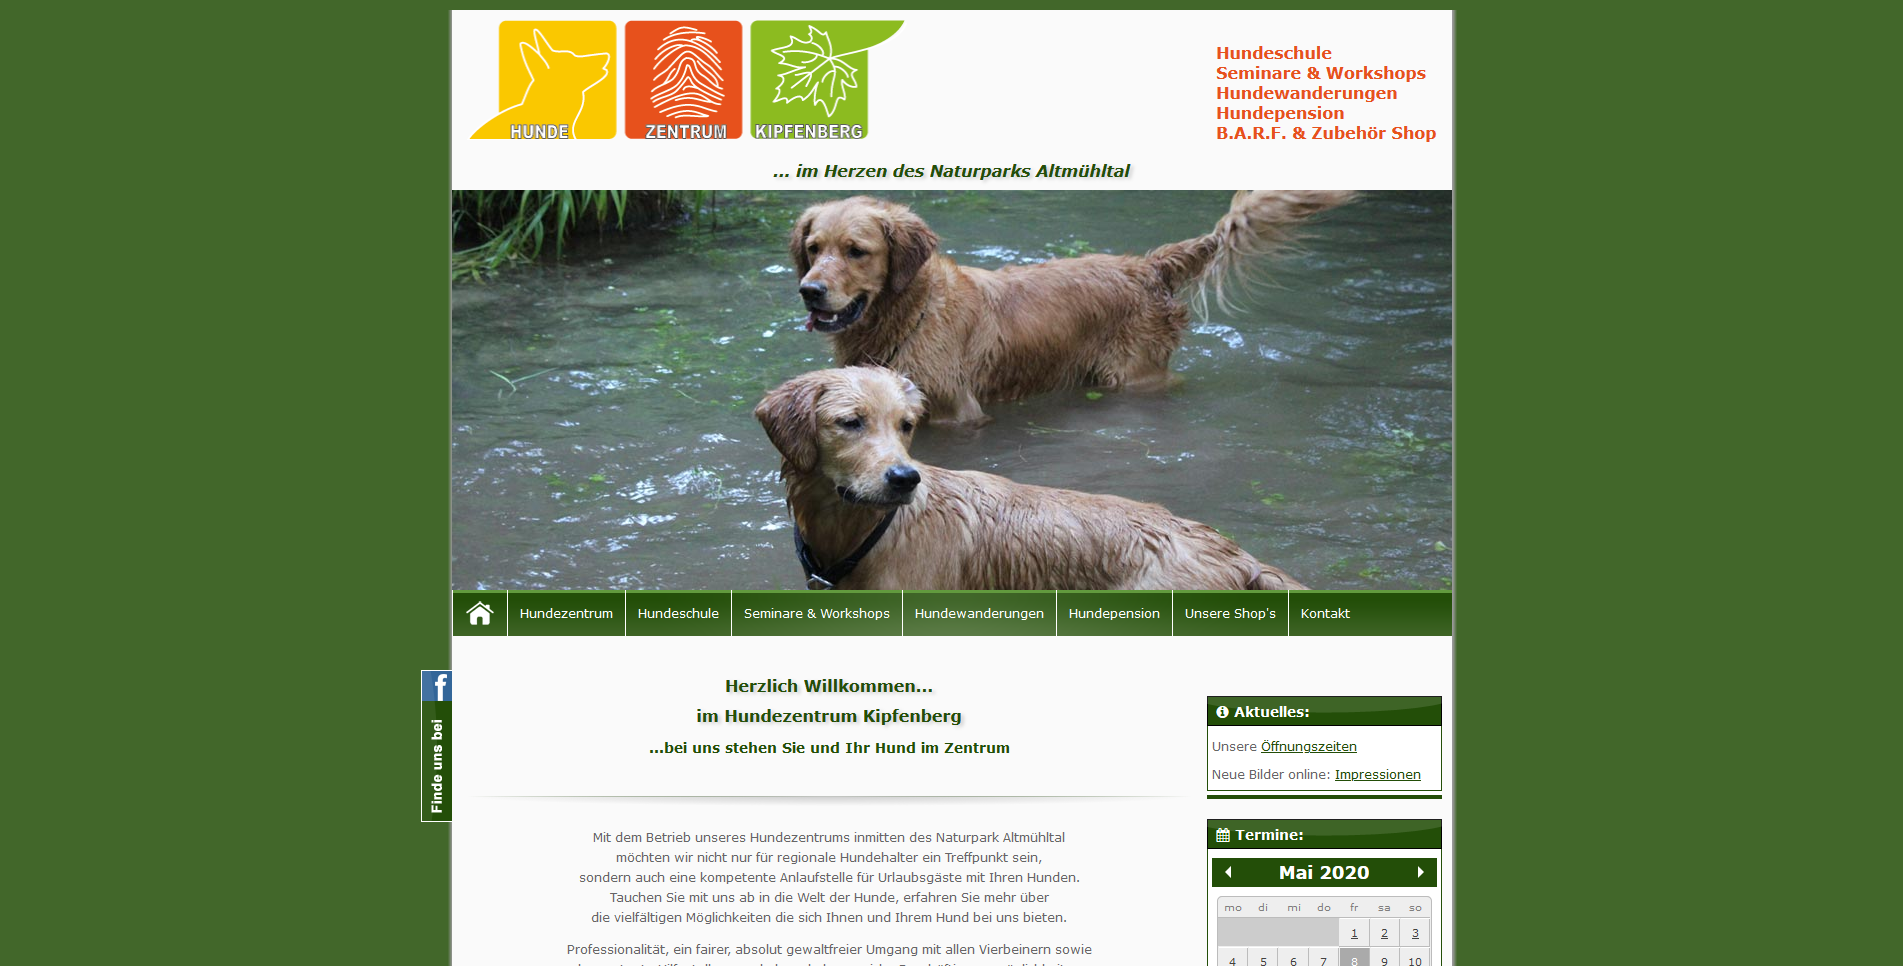 HundeZentrum Kipfenberg